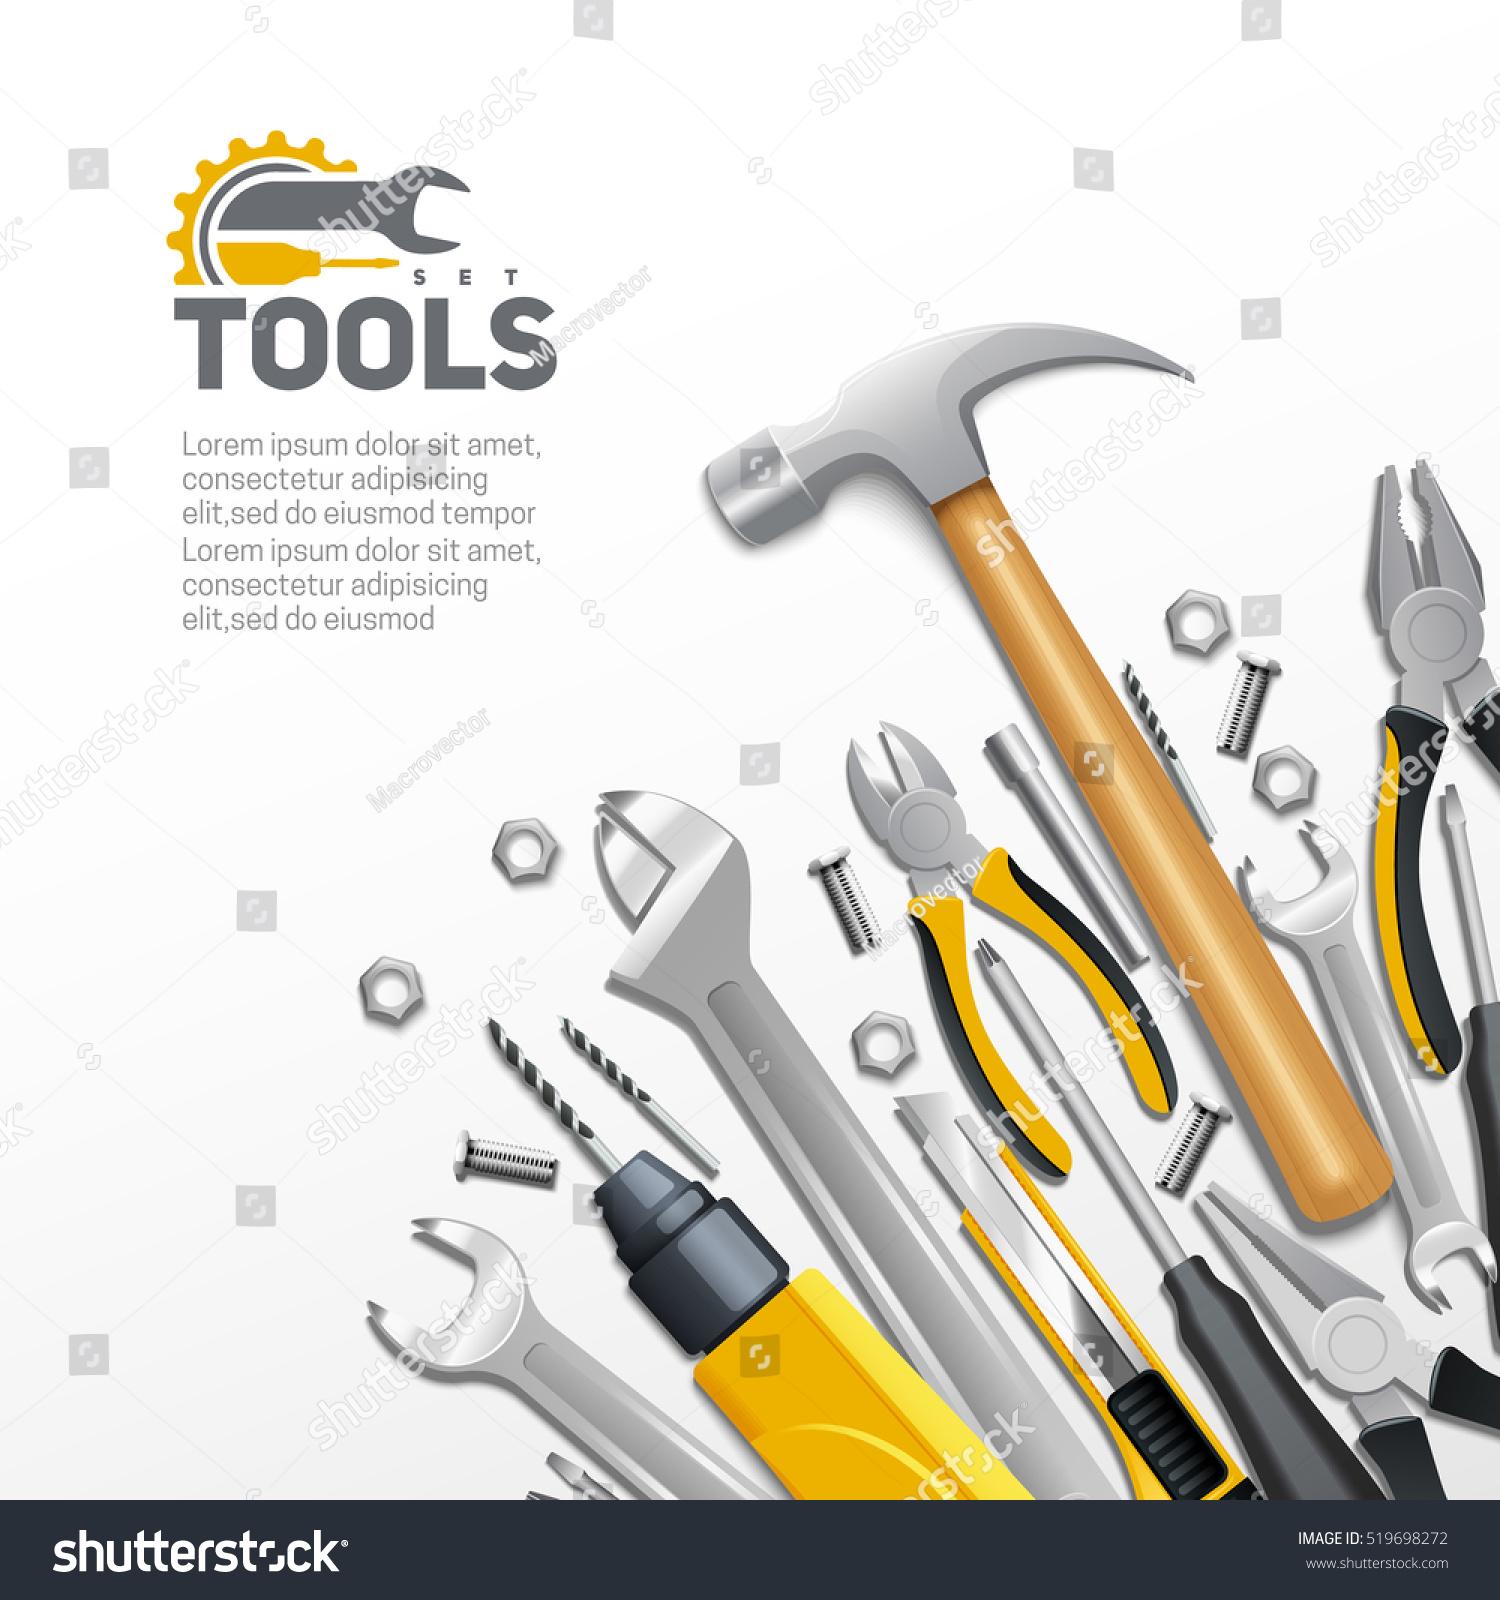 Großartig Haus Framing Tools Ideen - Benutzerdefinierte Bilderrahmen ...